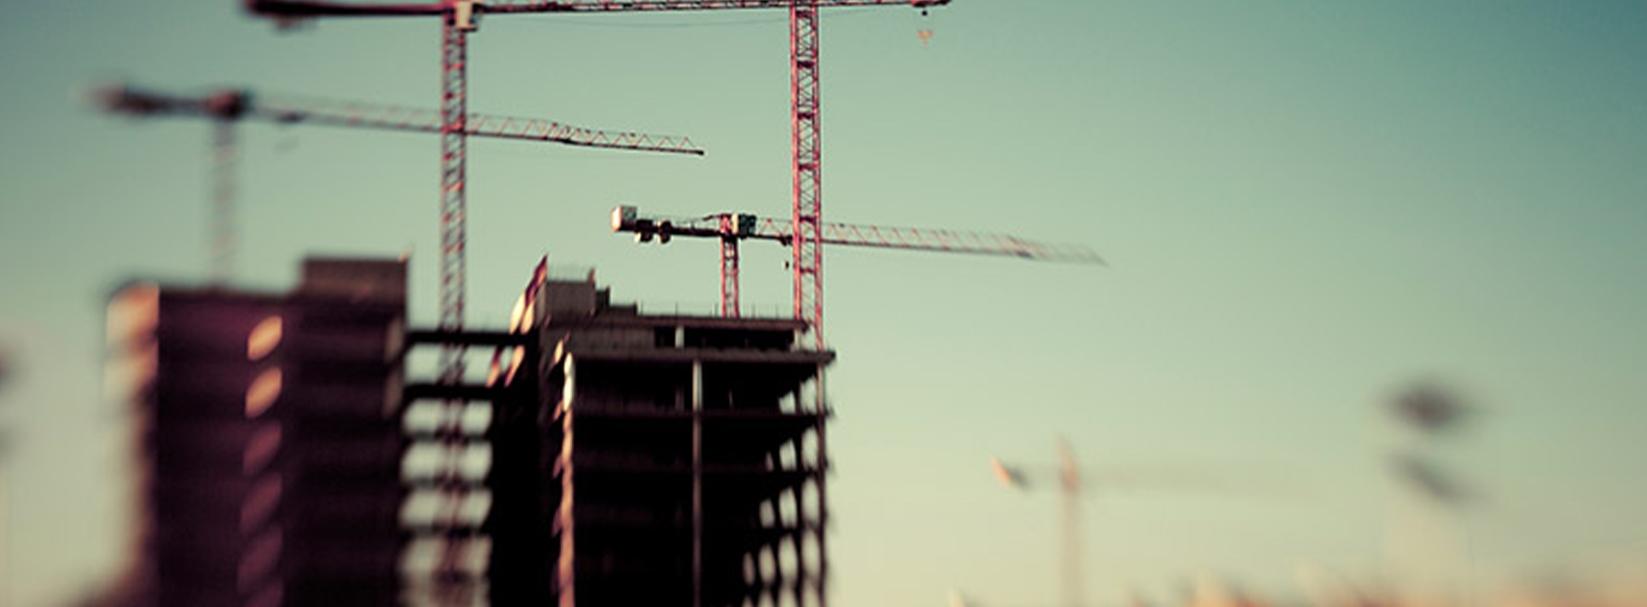 Sydney experiences unprecedented demand for development sites, despite residential slow-down